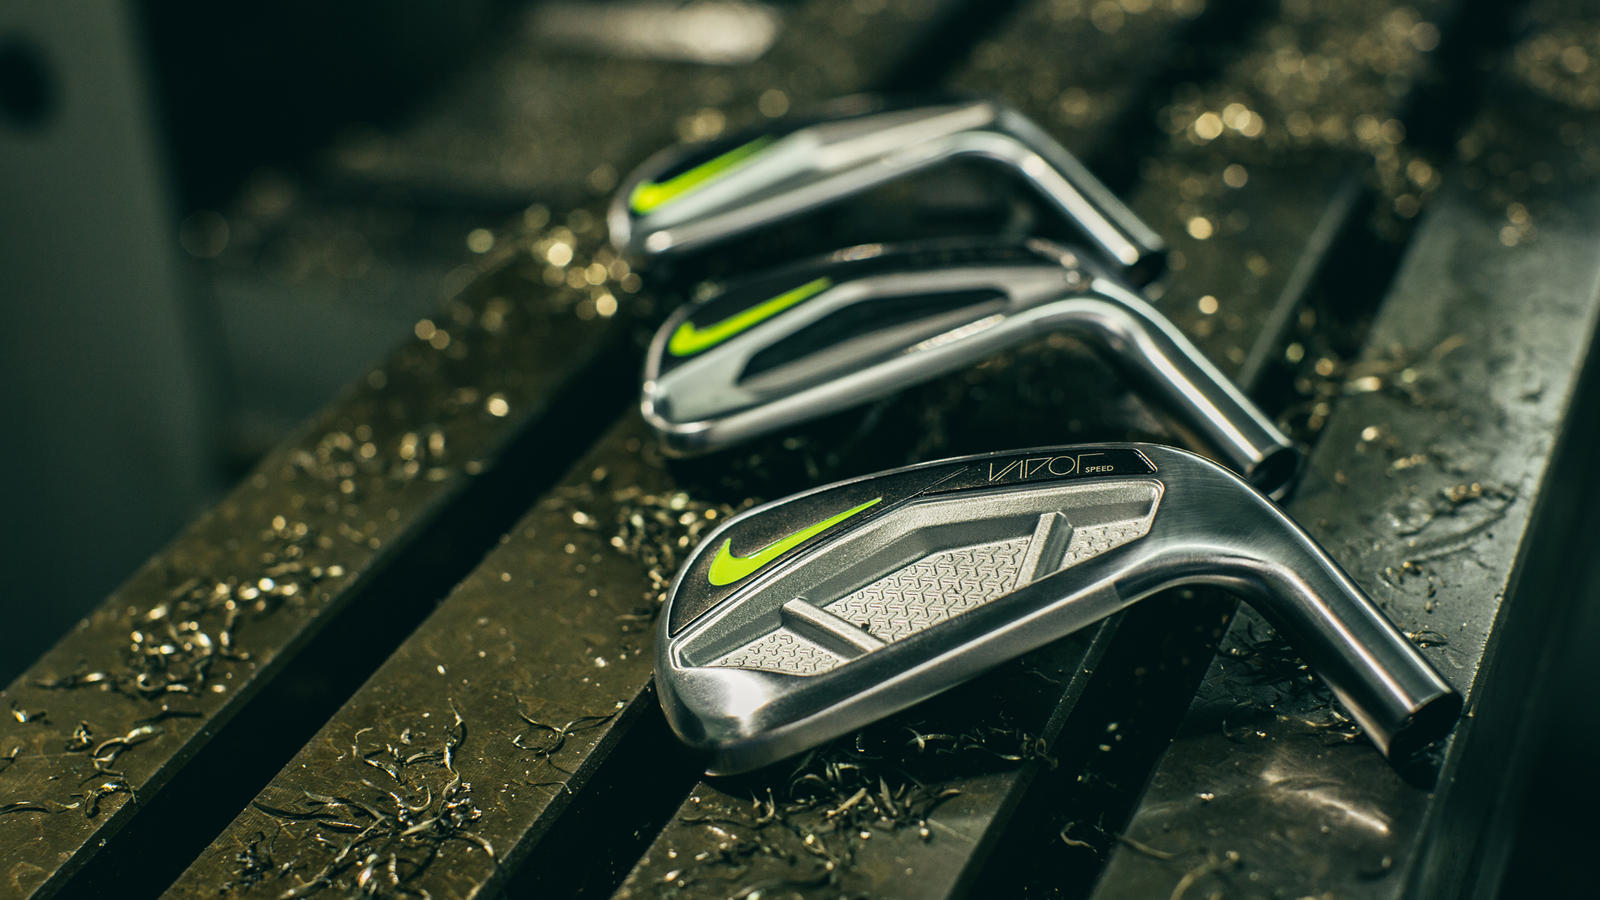 Nike Golf introduces the Vapor iron franchise.